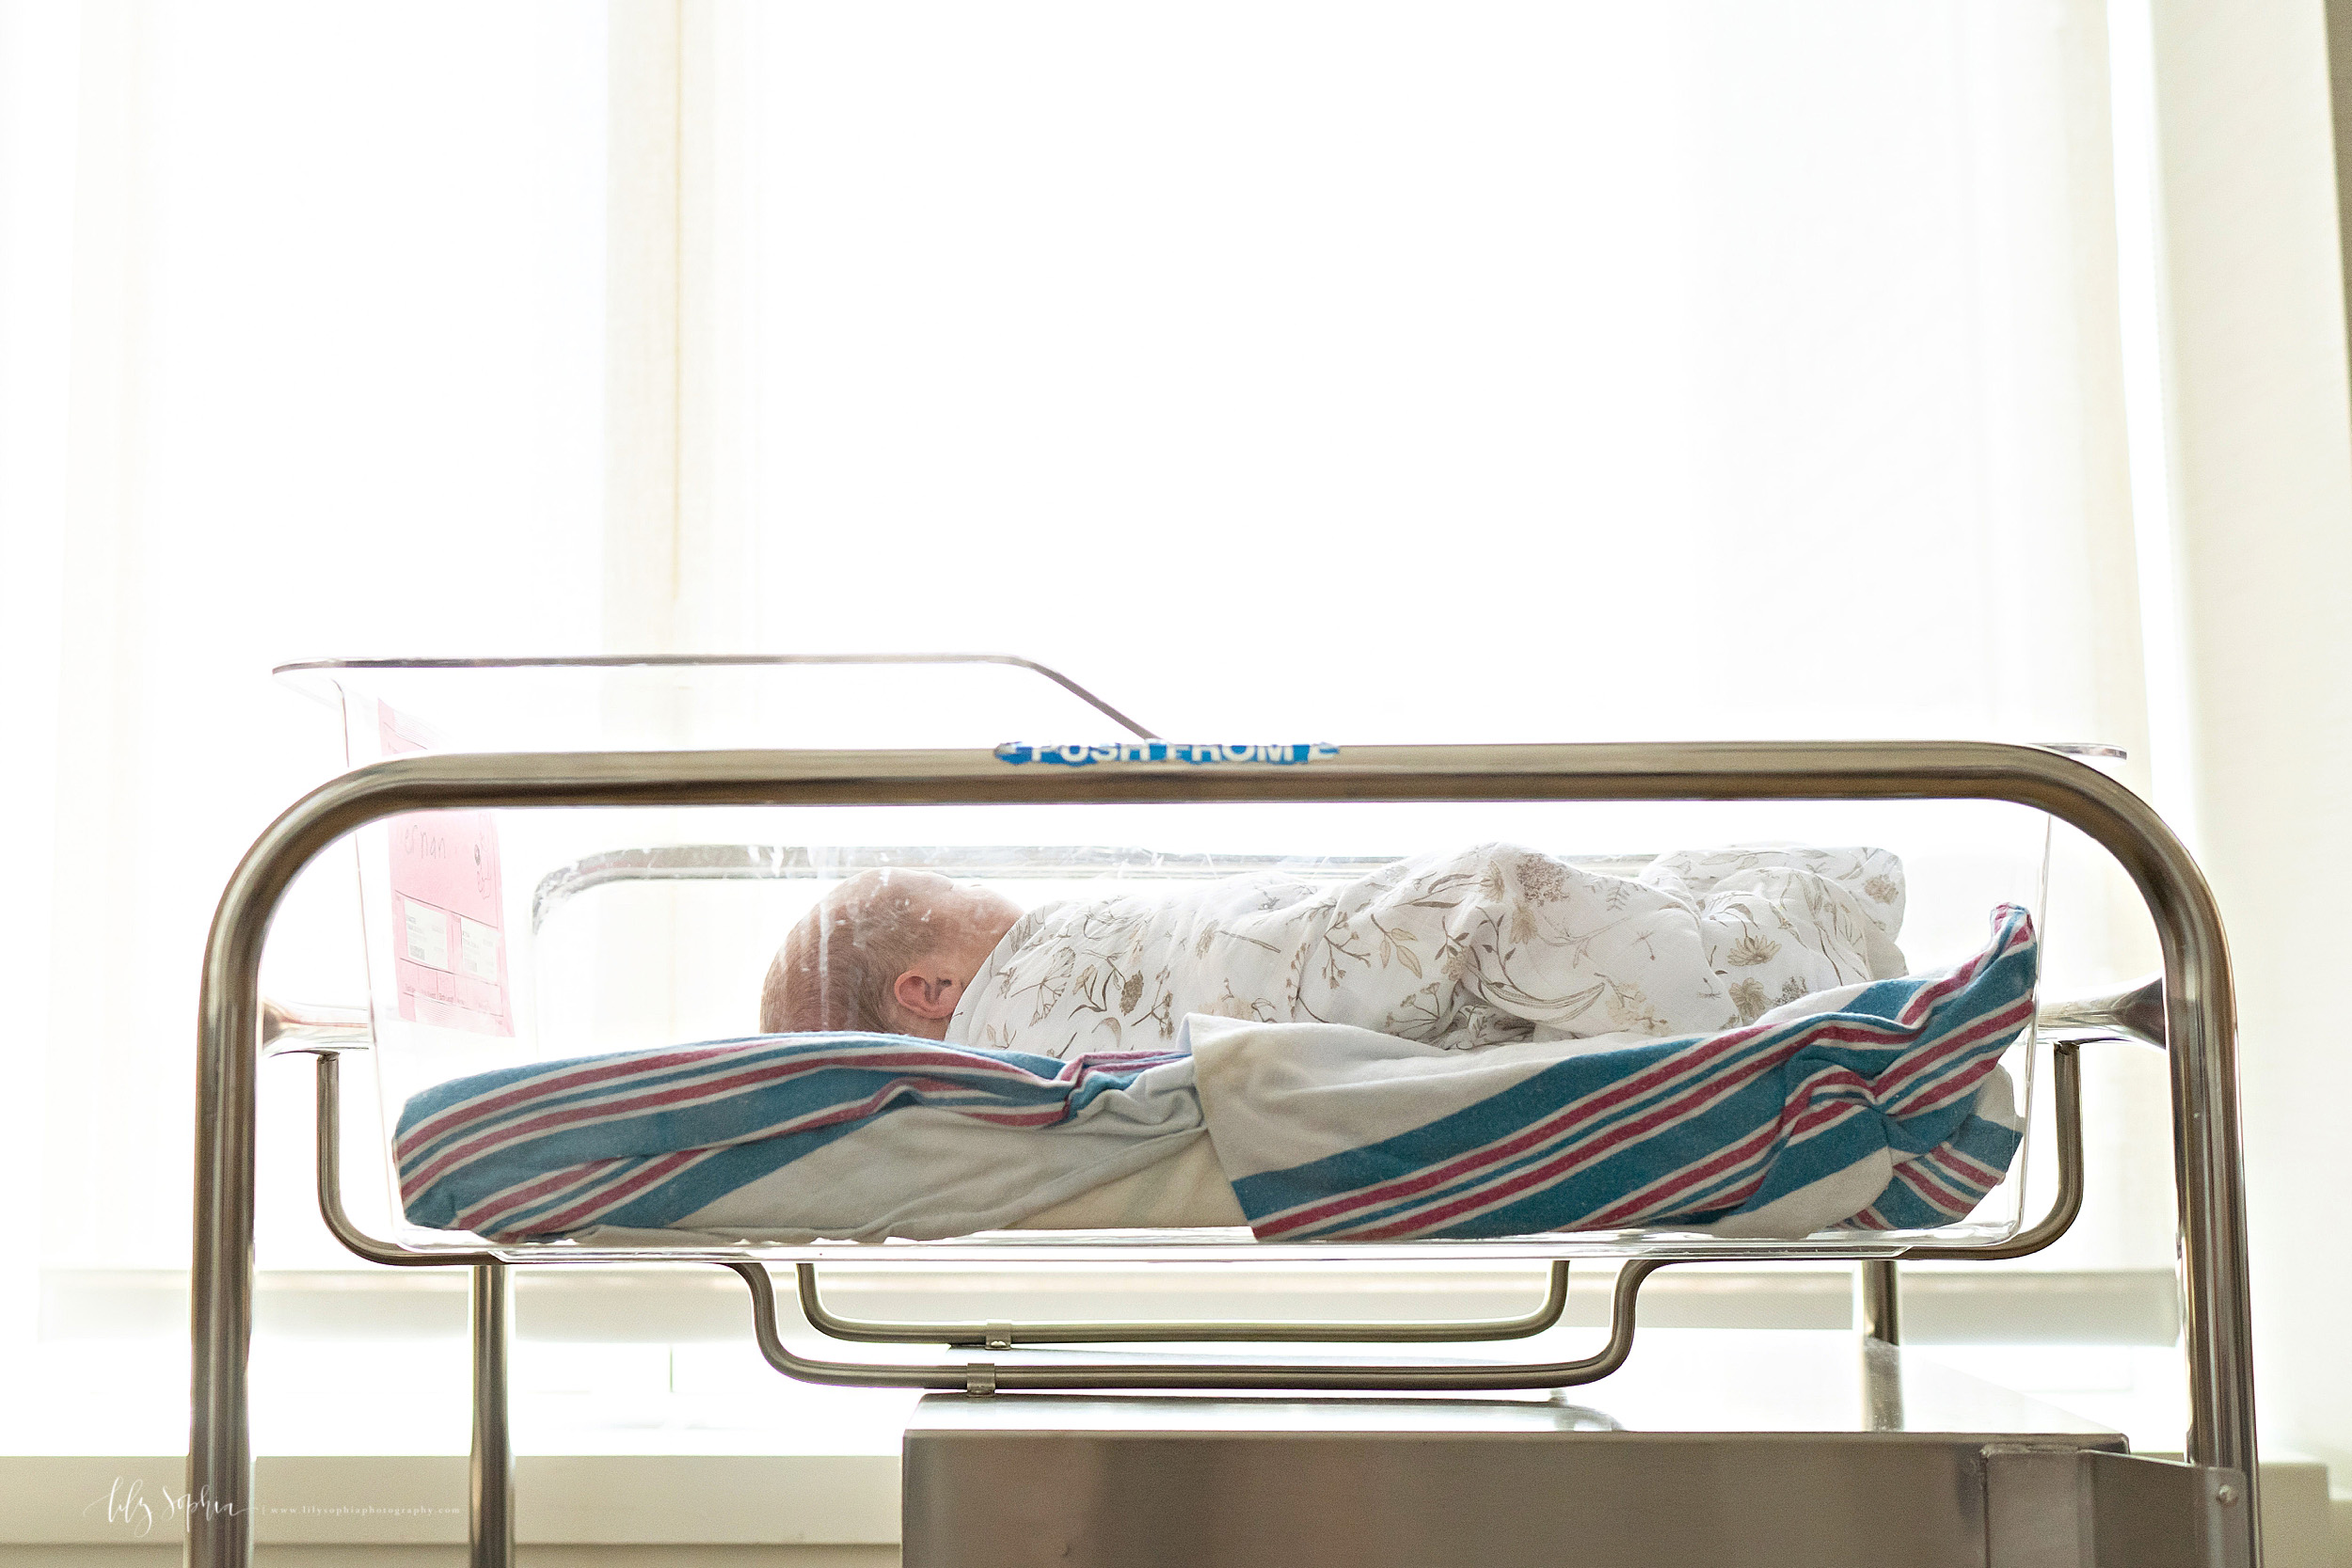 atlanta-decatur-candler-park-sandy-springs-buckhead-virginia-highlands-west-end-decatur-lily-sophia-photography-newborn-baby-girl-hospital-lifestyle-fresh-48-photos_2288.jpg